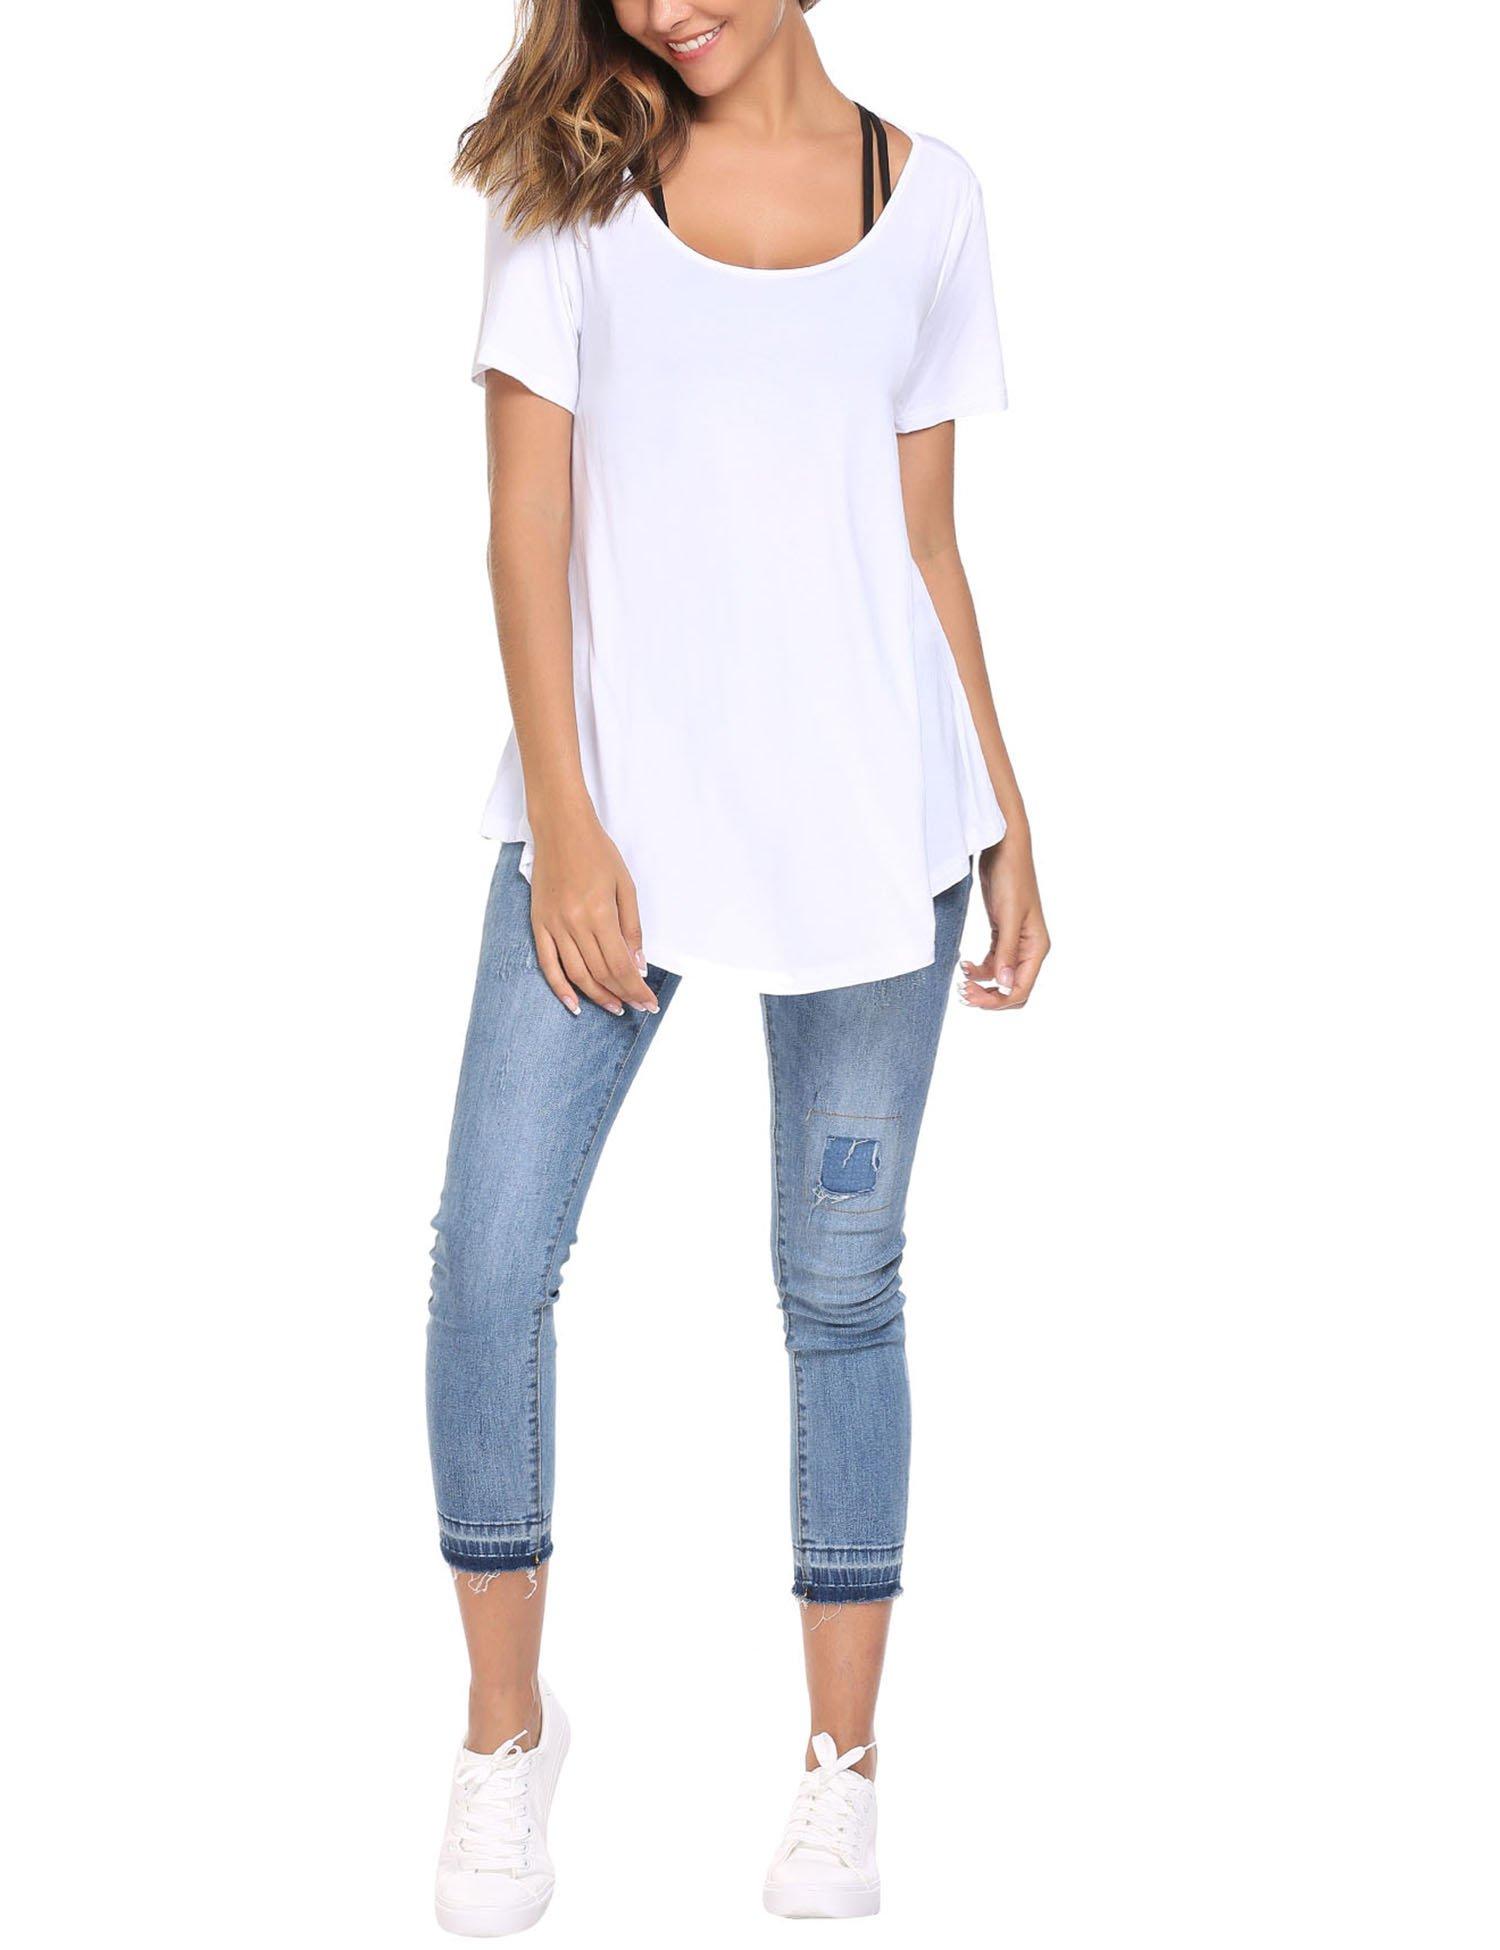 ELESOL Women Slim Fit Summer Tops Lightweight Basic High Low Hem T-Shirts White XXL by ELESOL (Image #4)